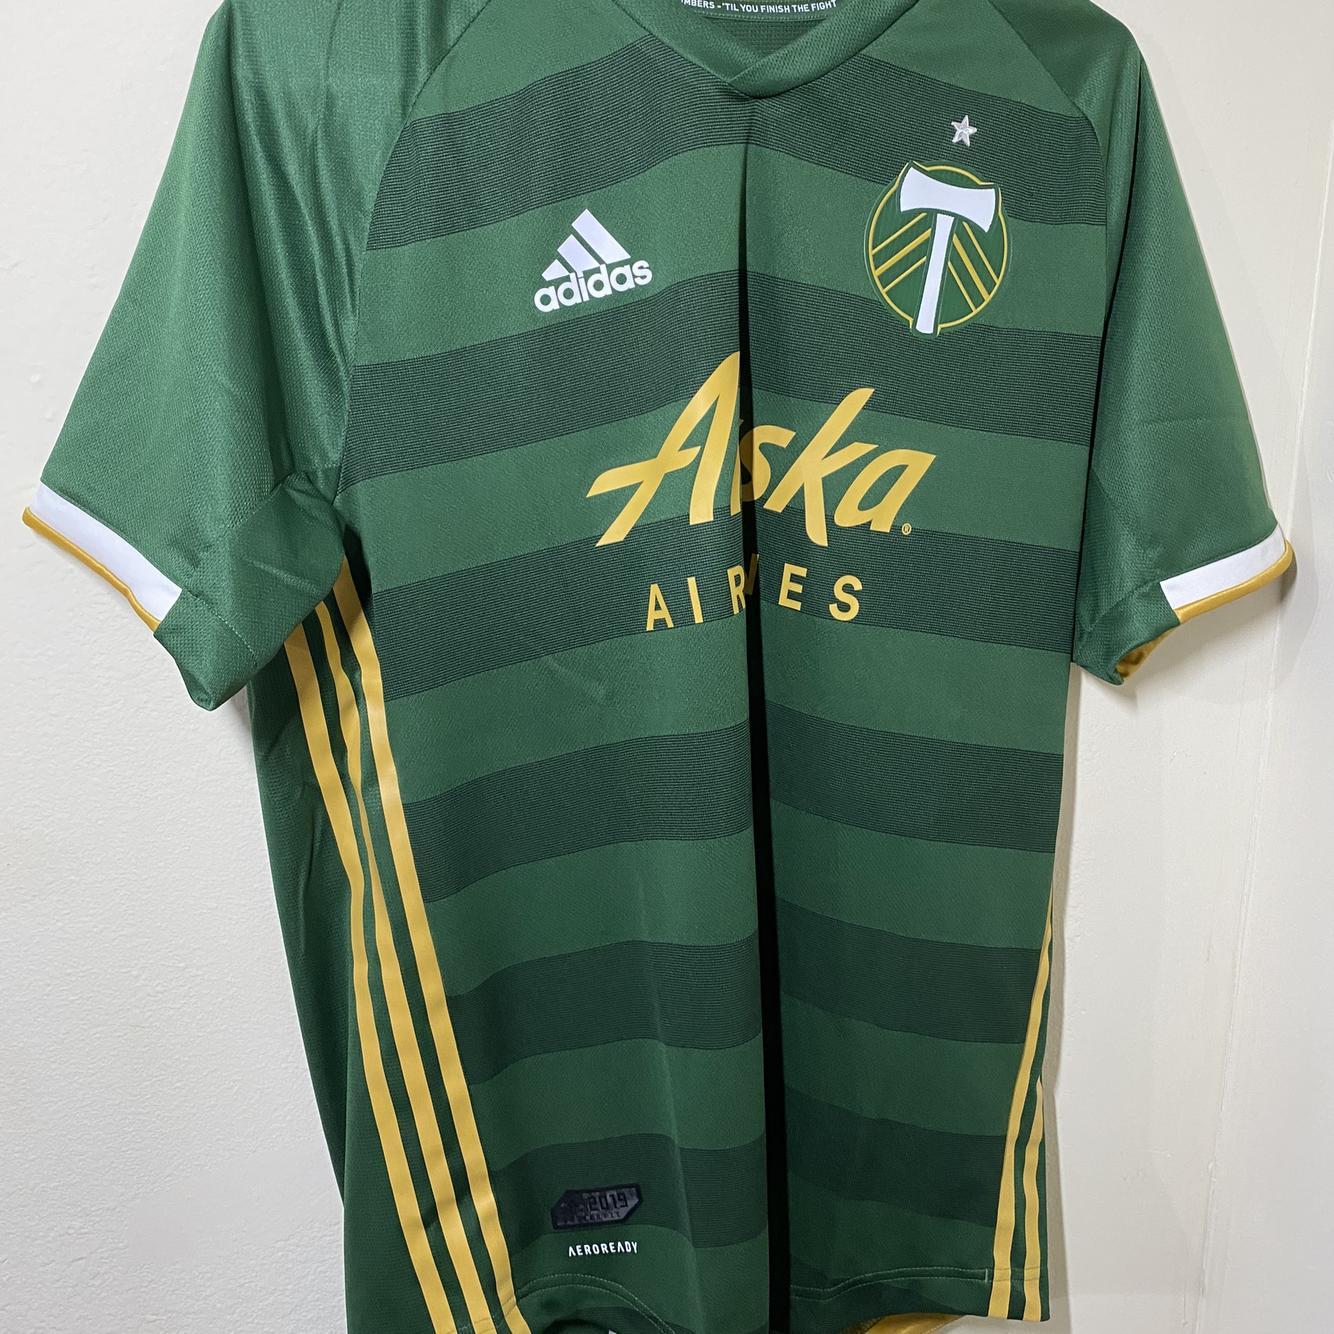 adidas 19/20 MLS Portland Timbers Authentic Home Jersey Men's Size medium